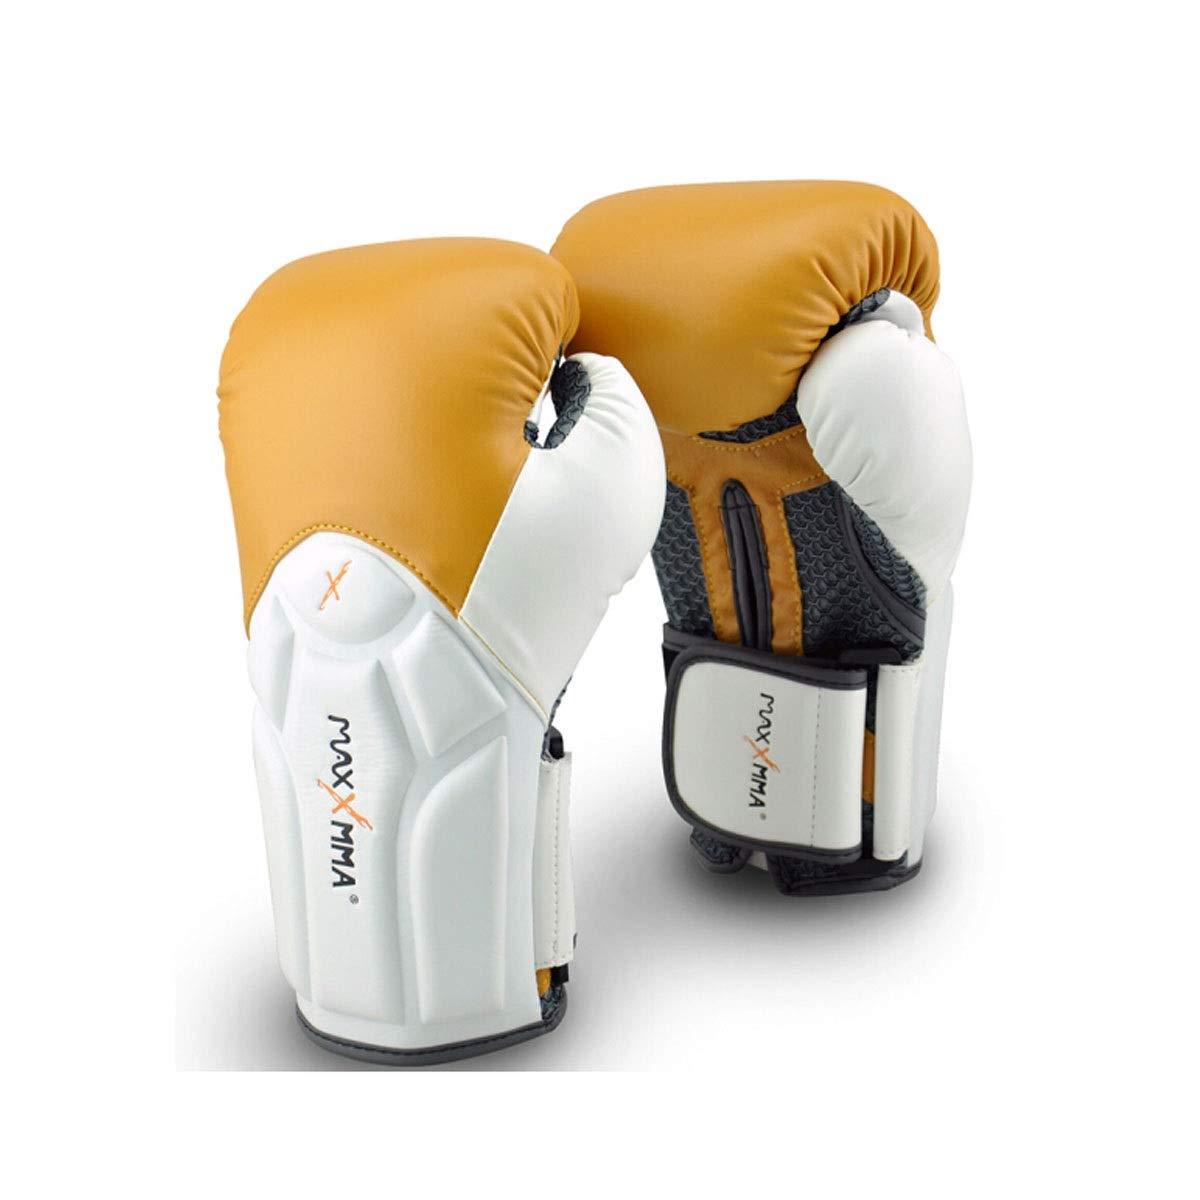 ZHIC ボクシングリストバンドグローブ、フィットネストレーニングムエタイ三田格闘技手袋、ラクダのファッション Life is movement  14OZ